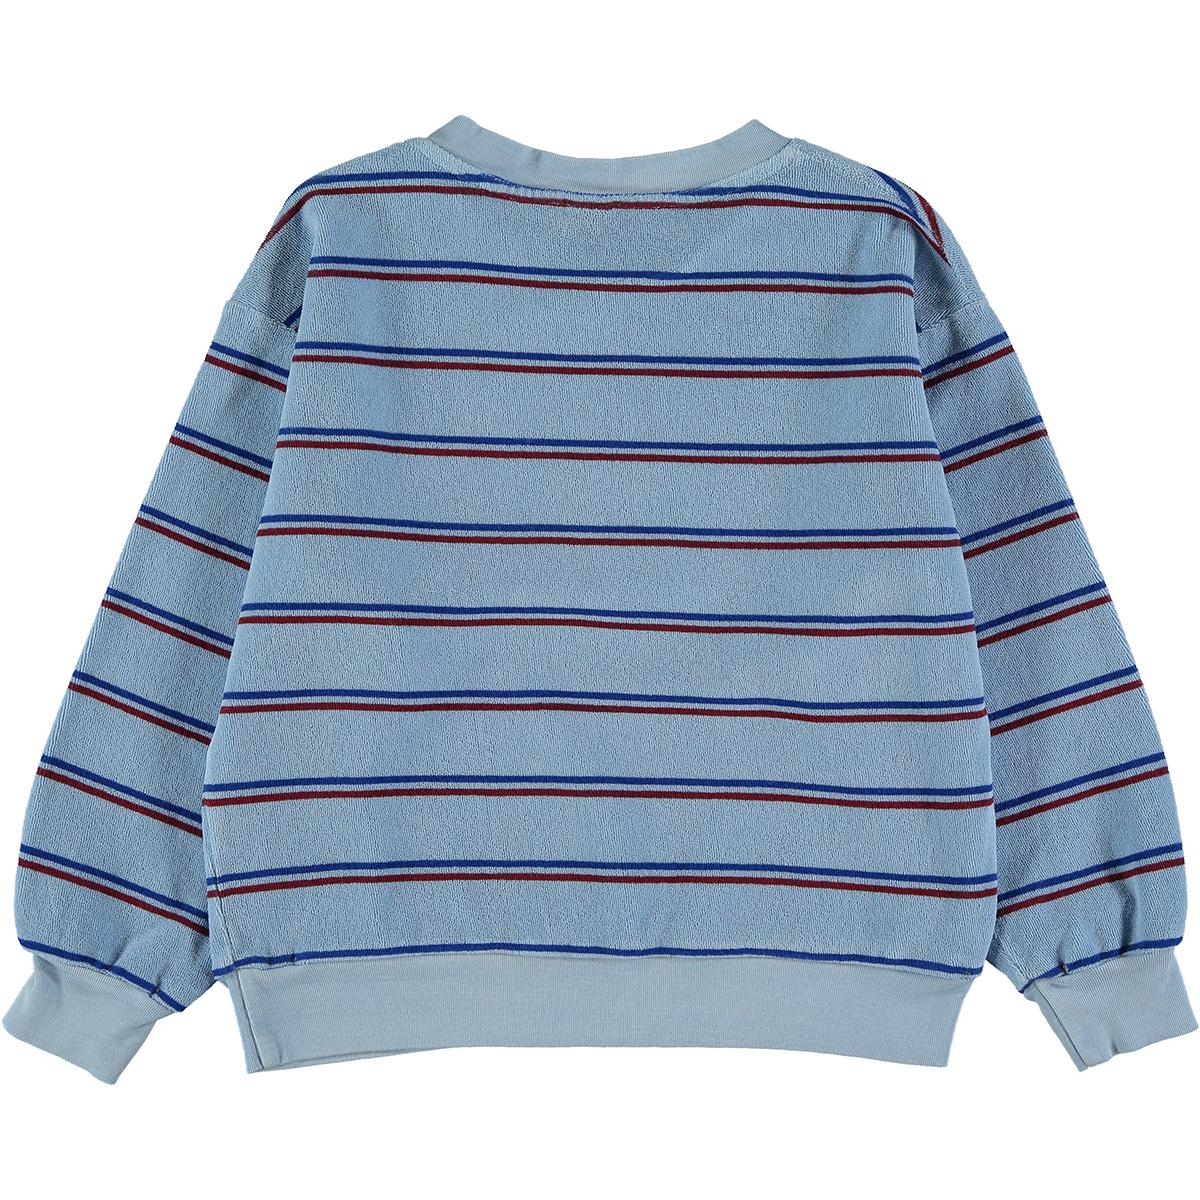 Sweatshirt baby Stripe - Light Blue-2